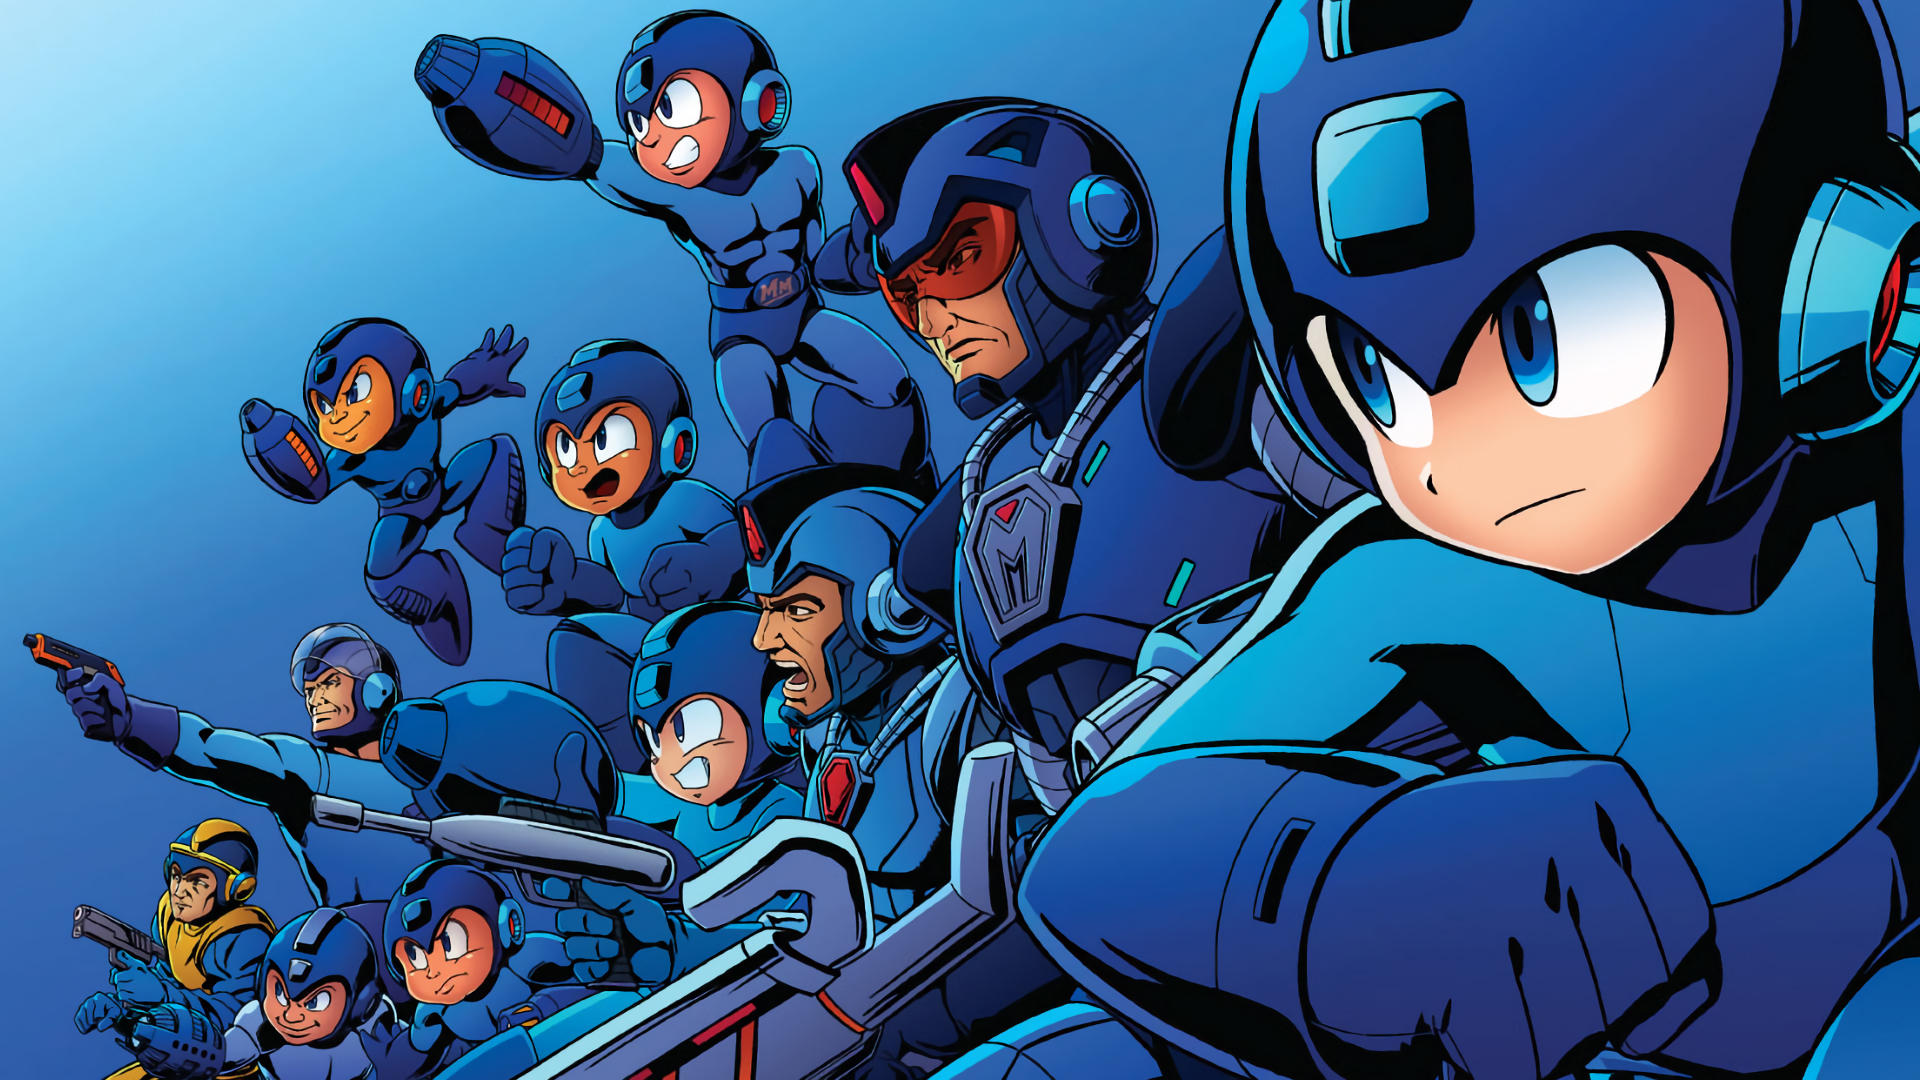 Mega Man 30th Anniversary Wallpapers